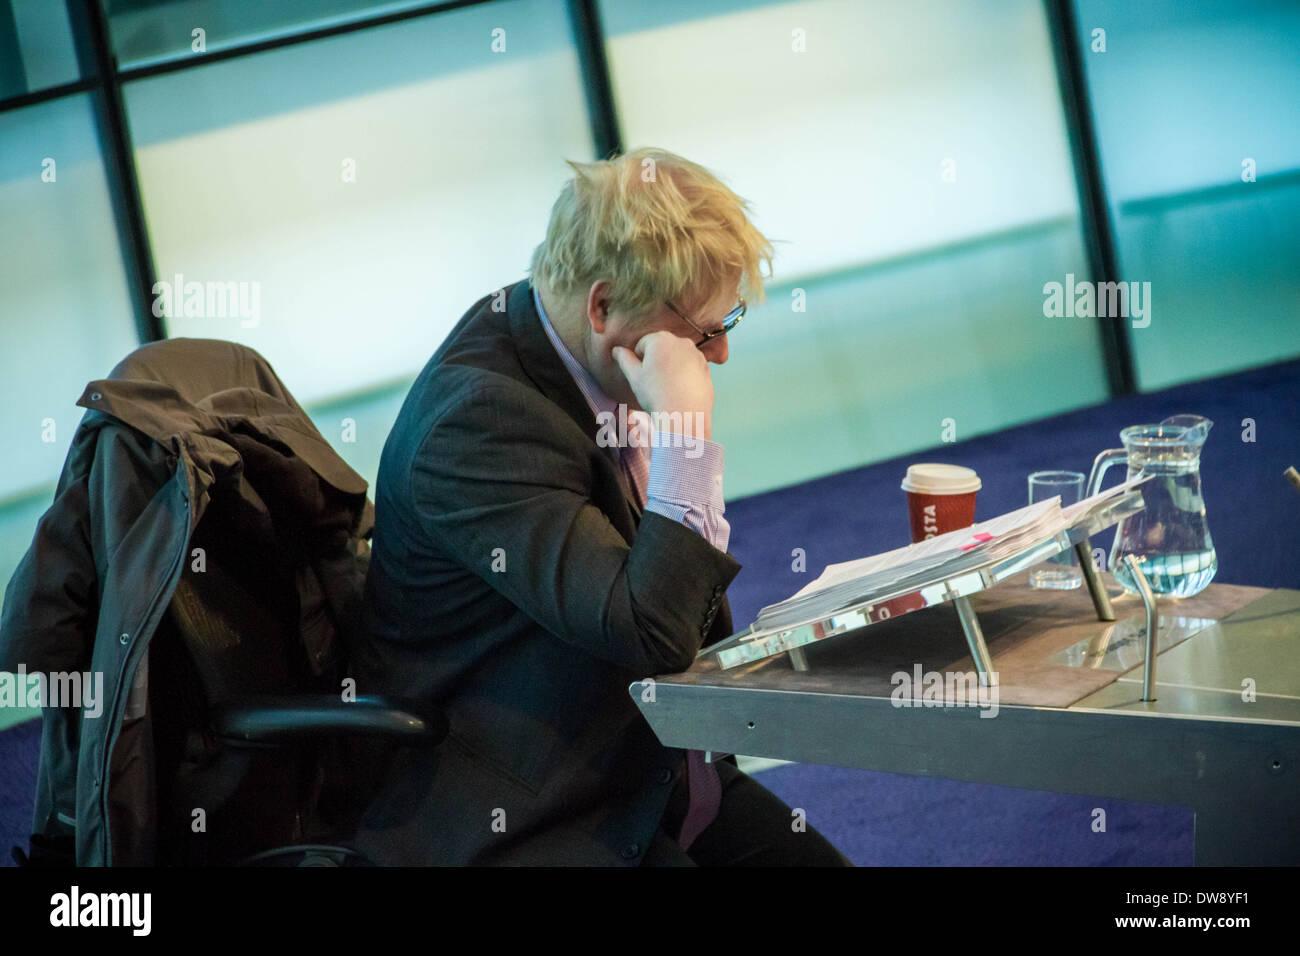 London Mayor Boris Johnson Question Time at City Hall - Stock Image